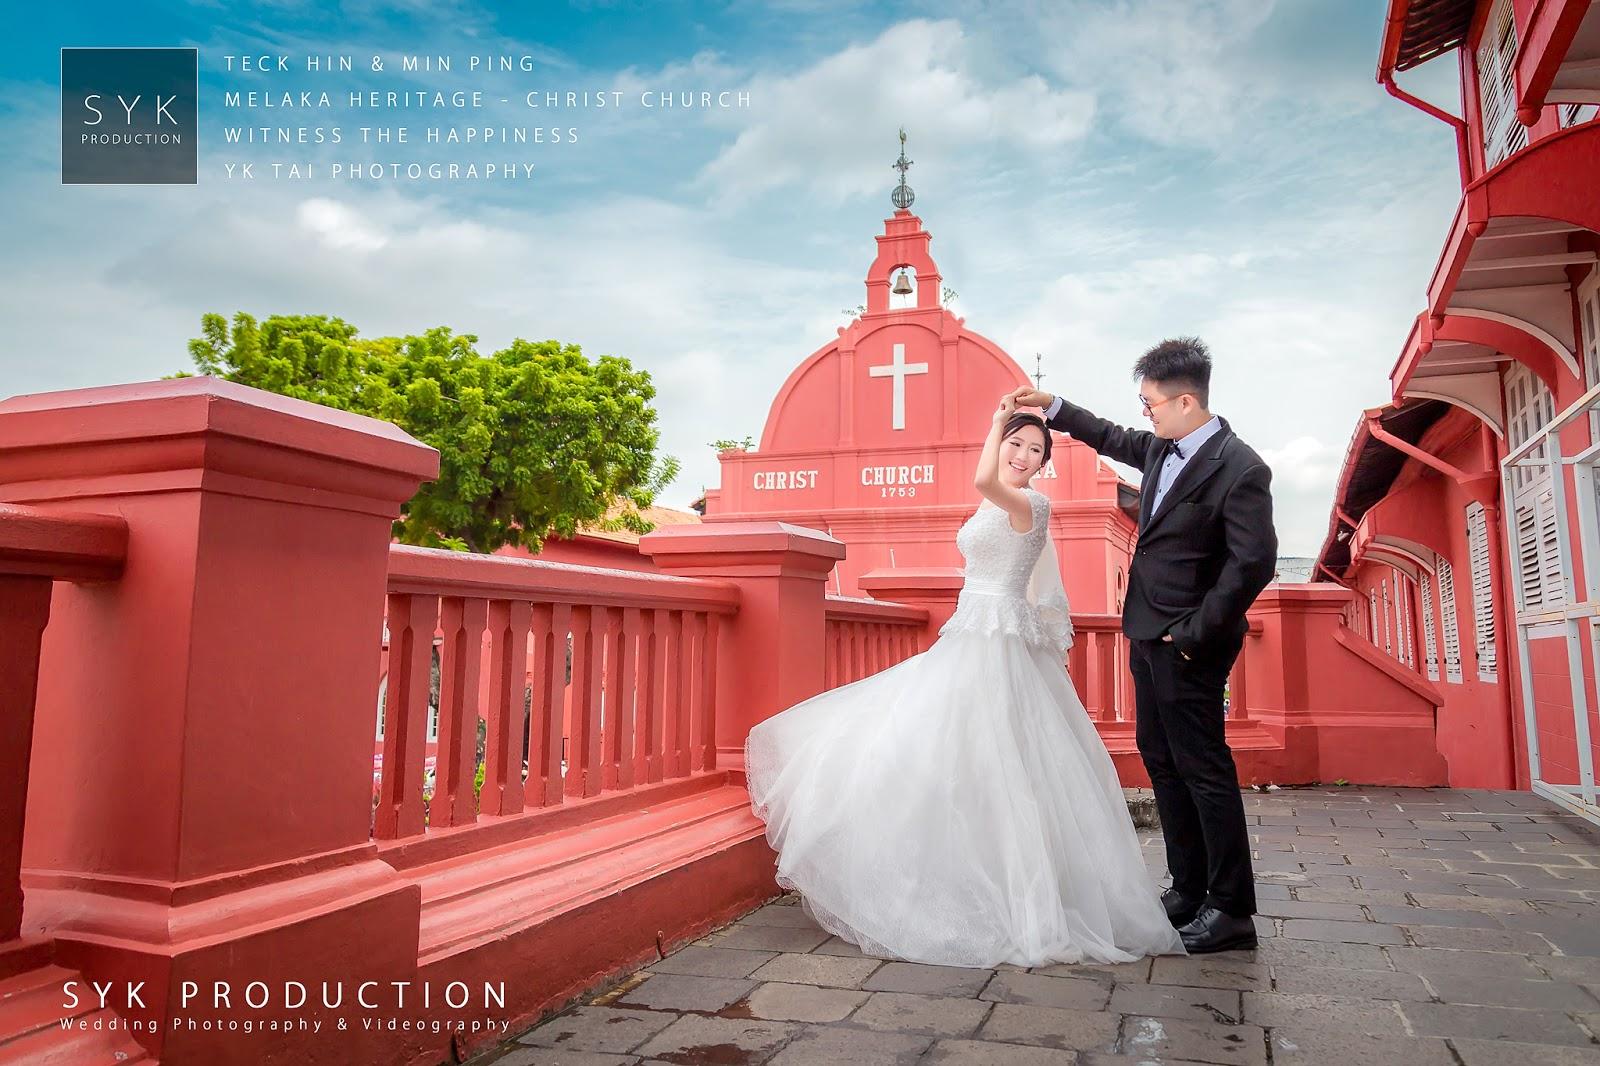 Wedding photographer photography melaka malaysia yk tai photography we provide wedding photography videography melaka seremban johor muar kl photographer junglespirit Gallery